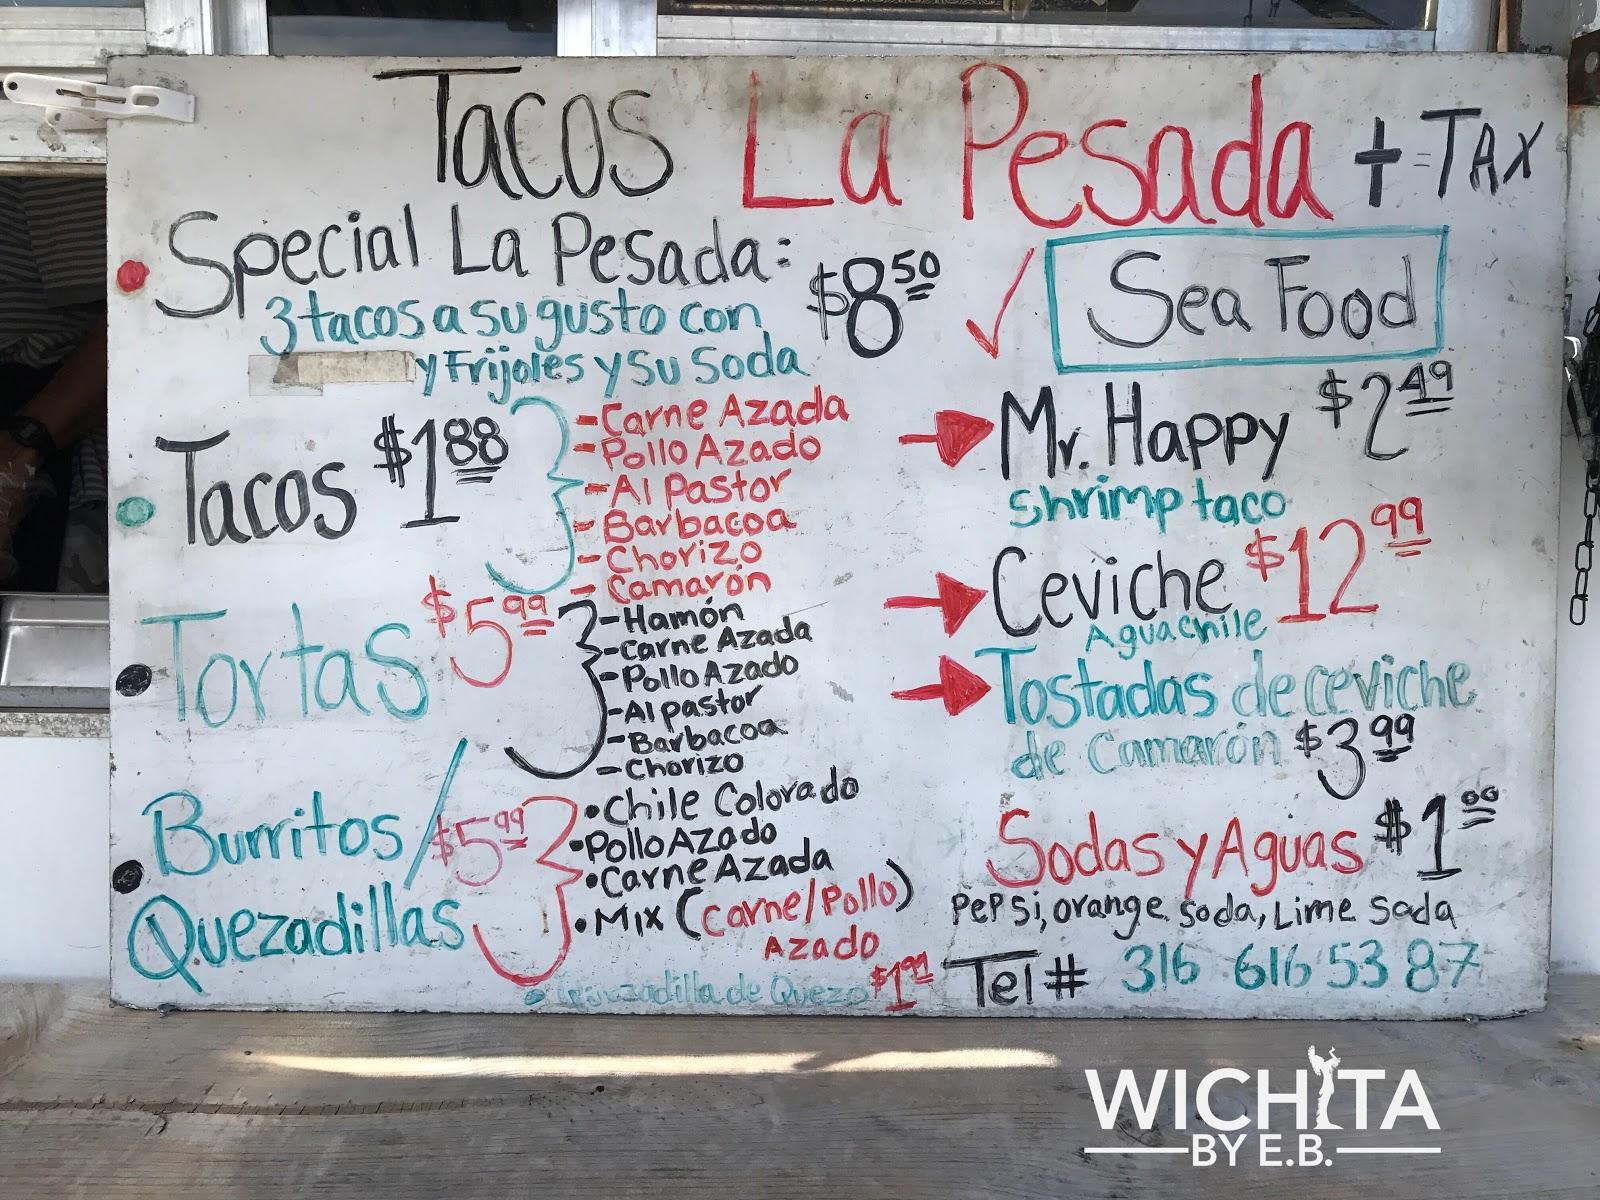 Food Truck: Tacos La Pesada Review – Wichita By E.B.